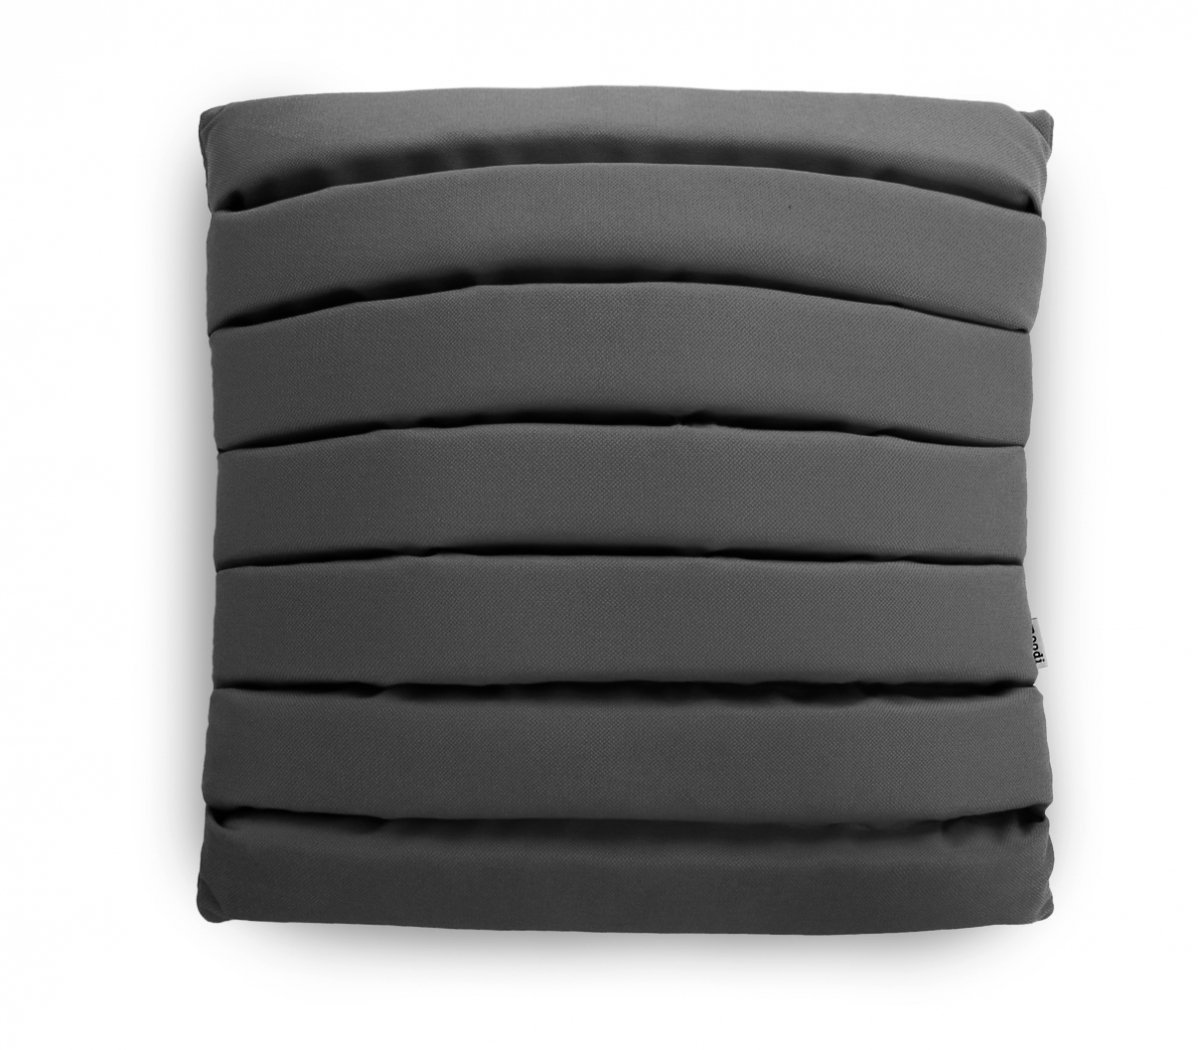 Level poduszka dekoracyjna MOODI 40x40 cm. szara